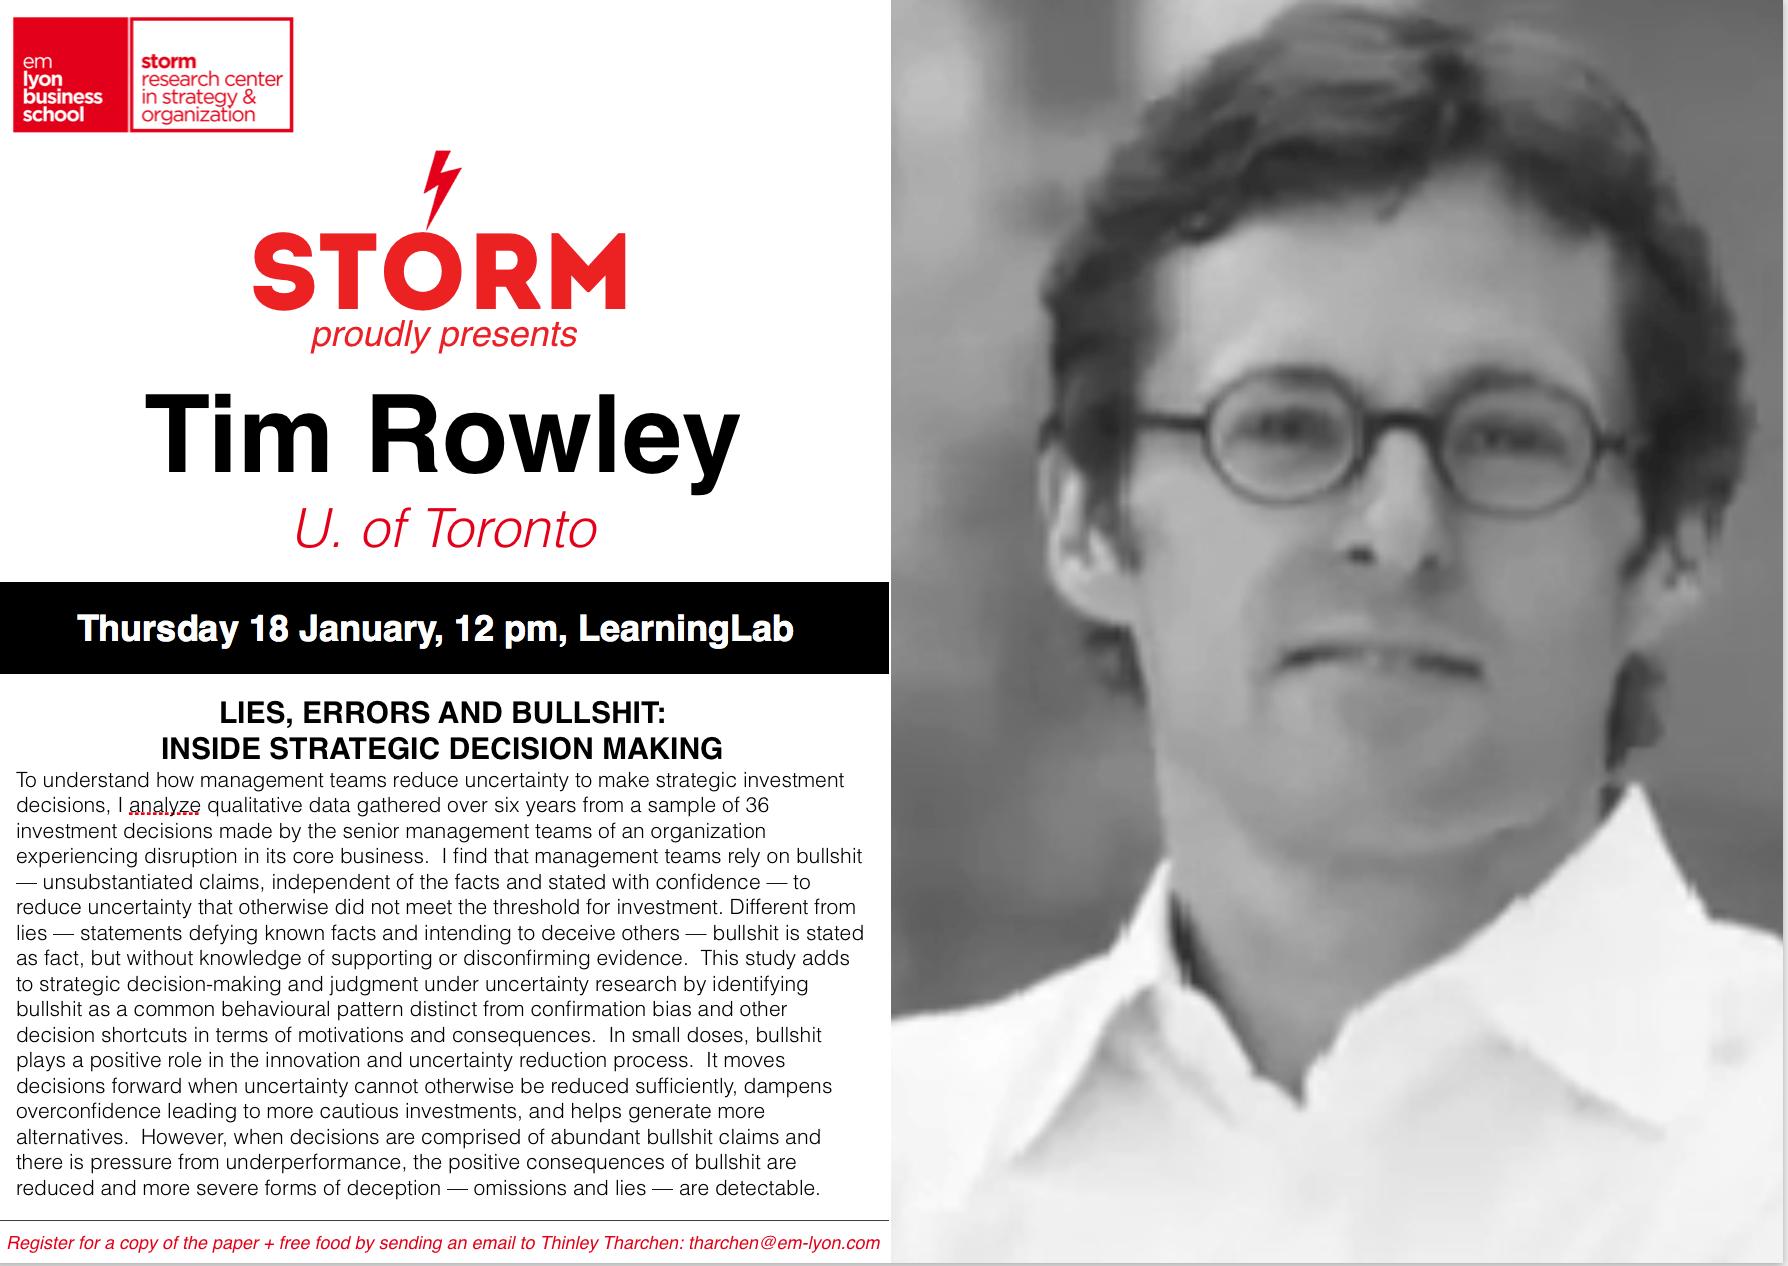 18 January 2018: TIM ROWLEY (U. of Toronto)